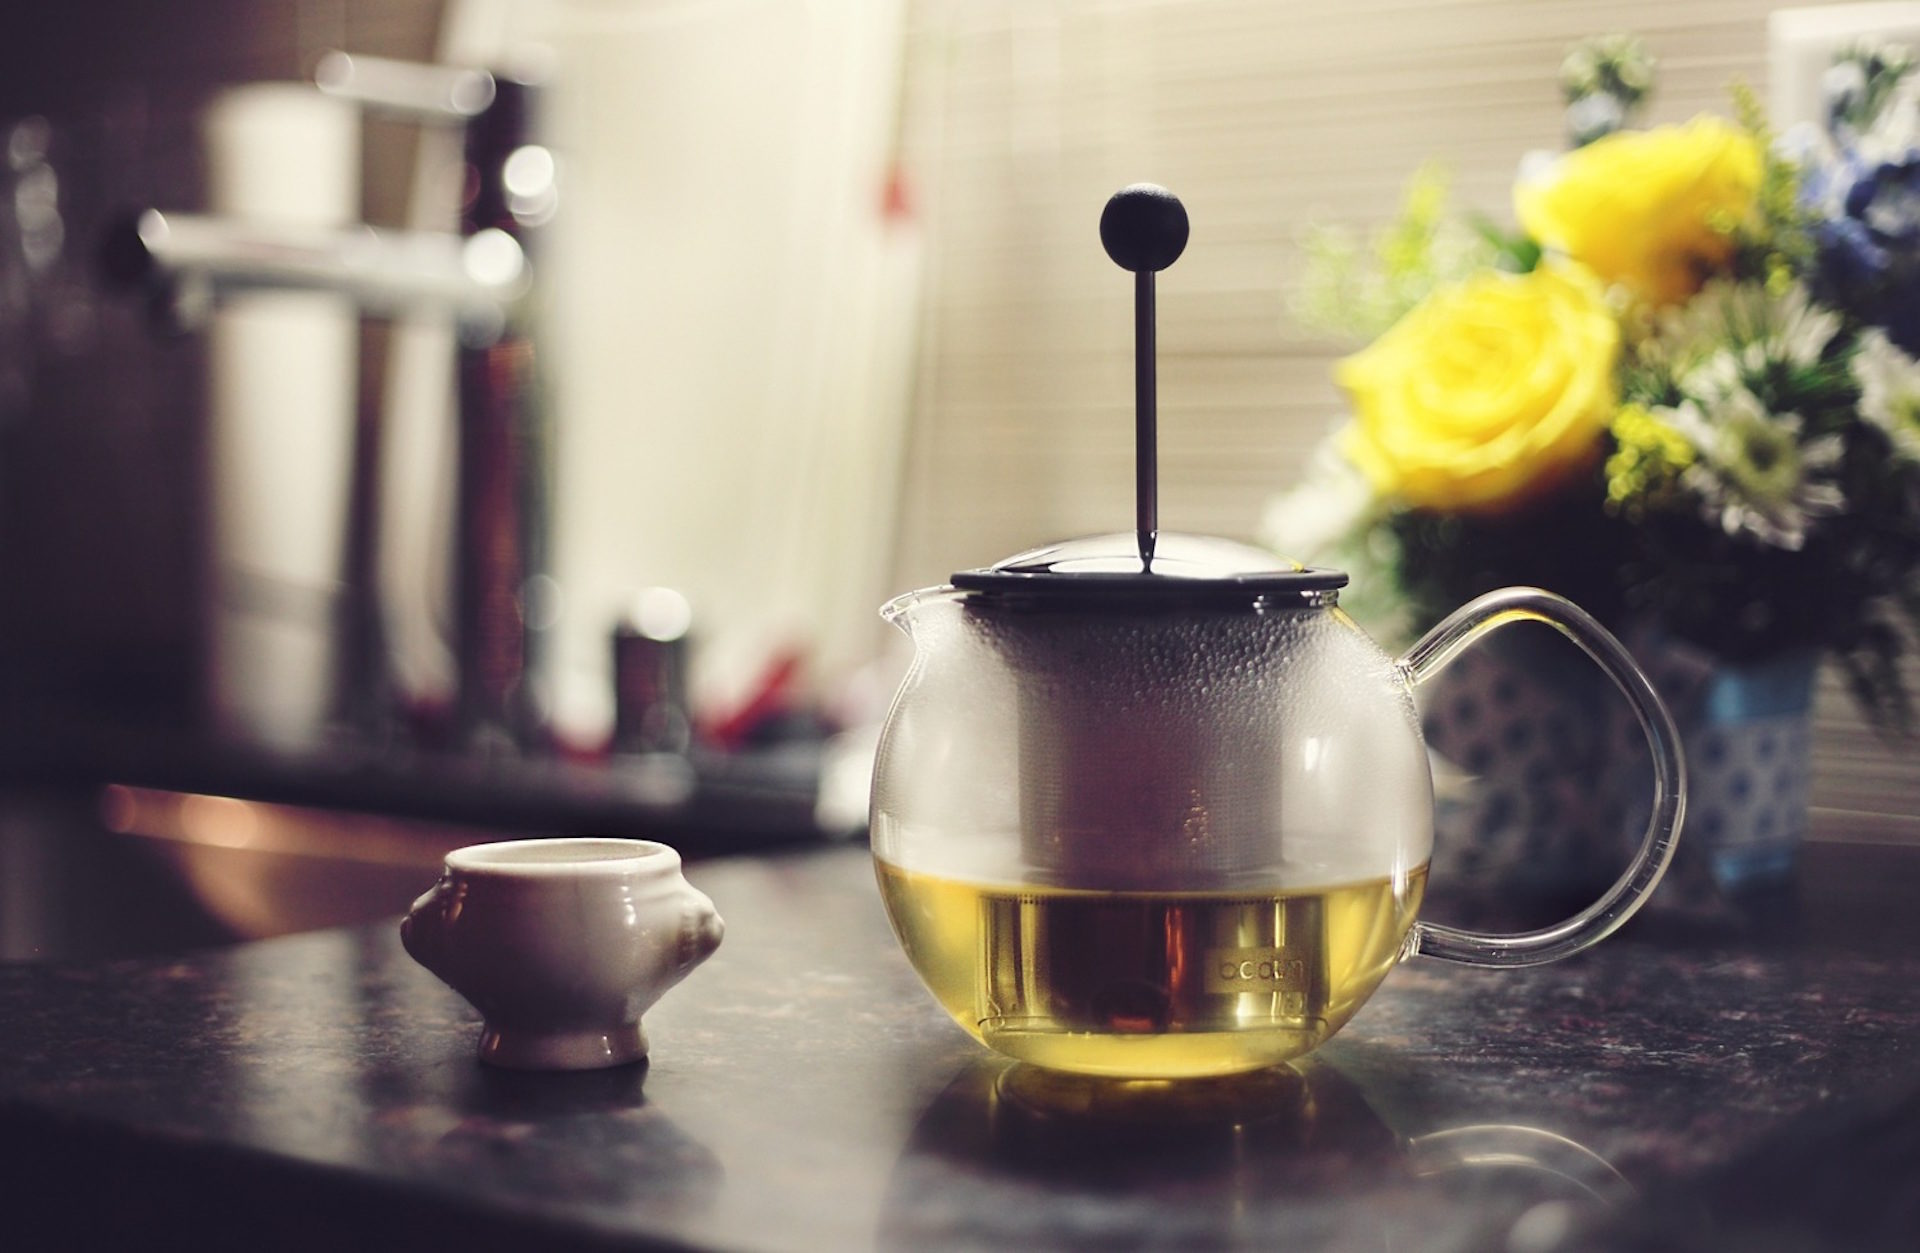 tetera, الشاي, شراب, ضخ, الزهور - خلفيات عالية الدقة - أستاذ falken.com